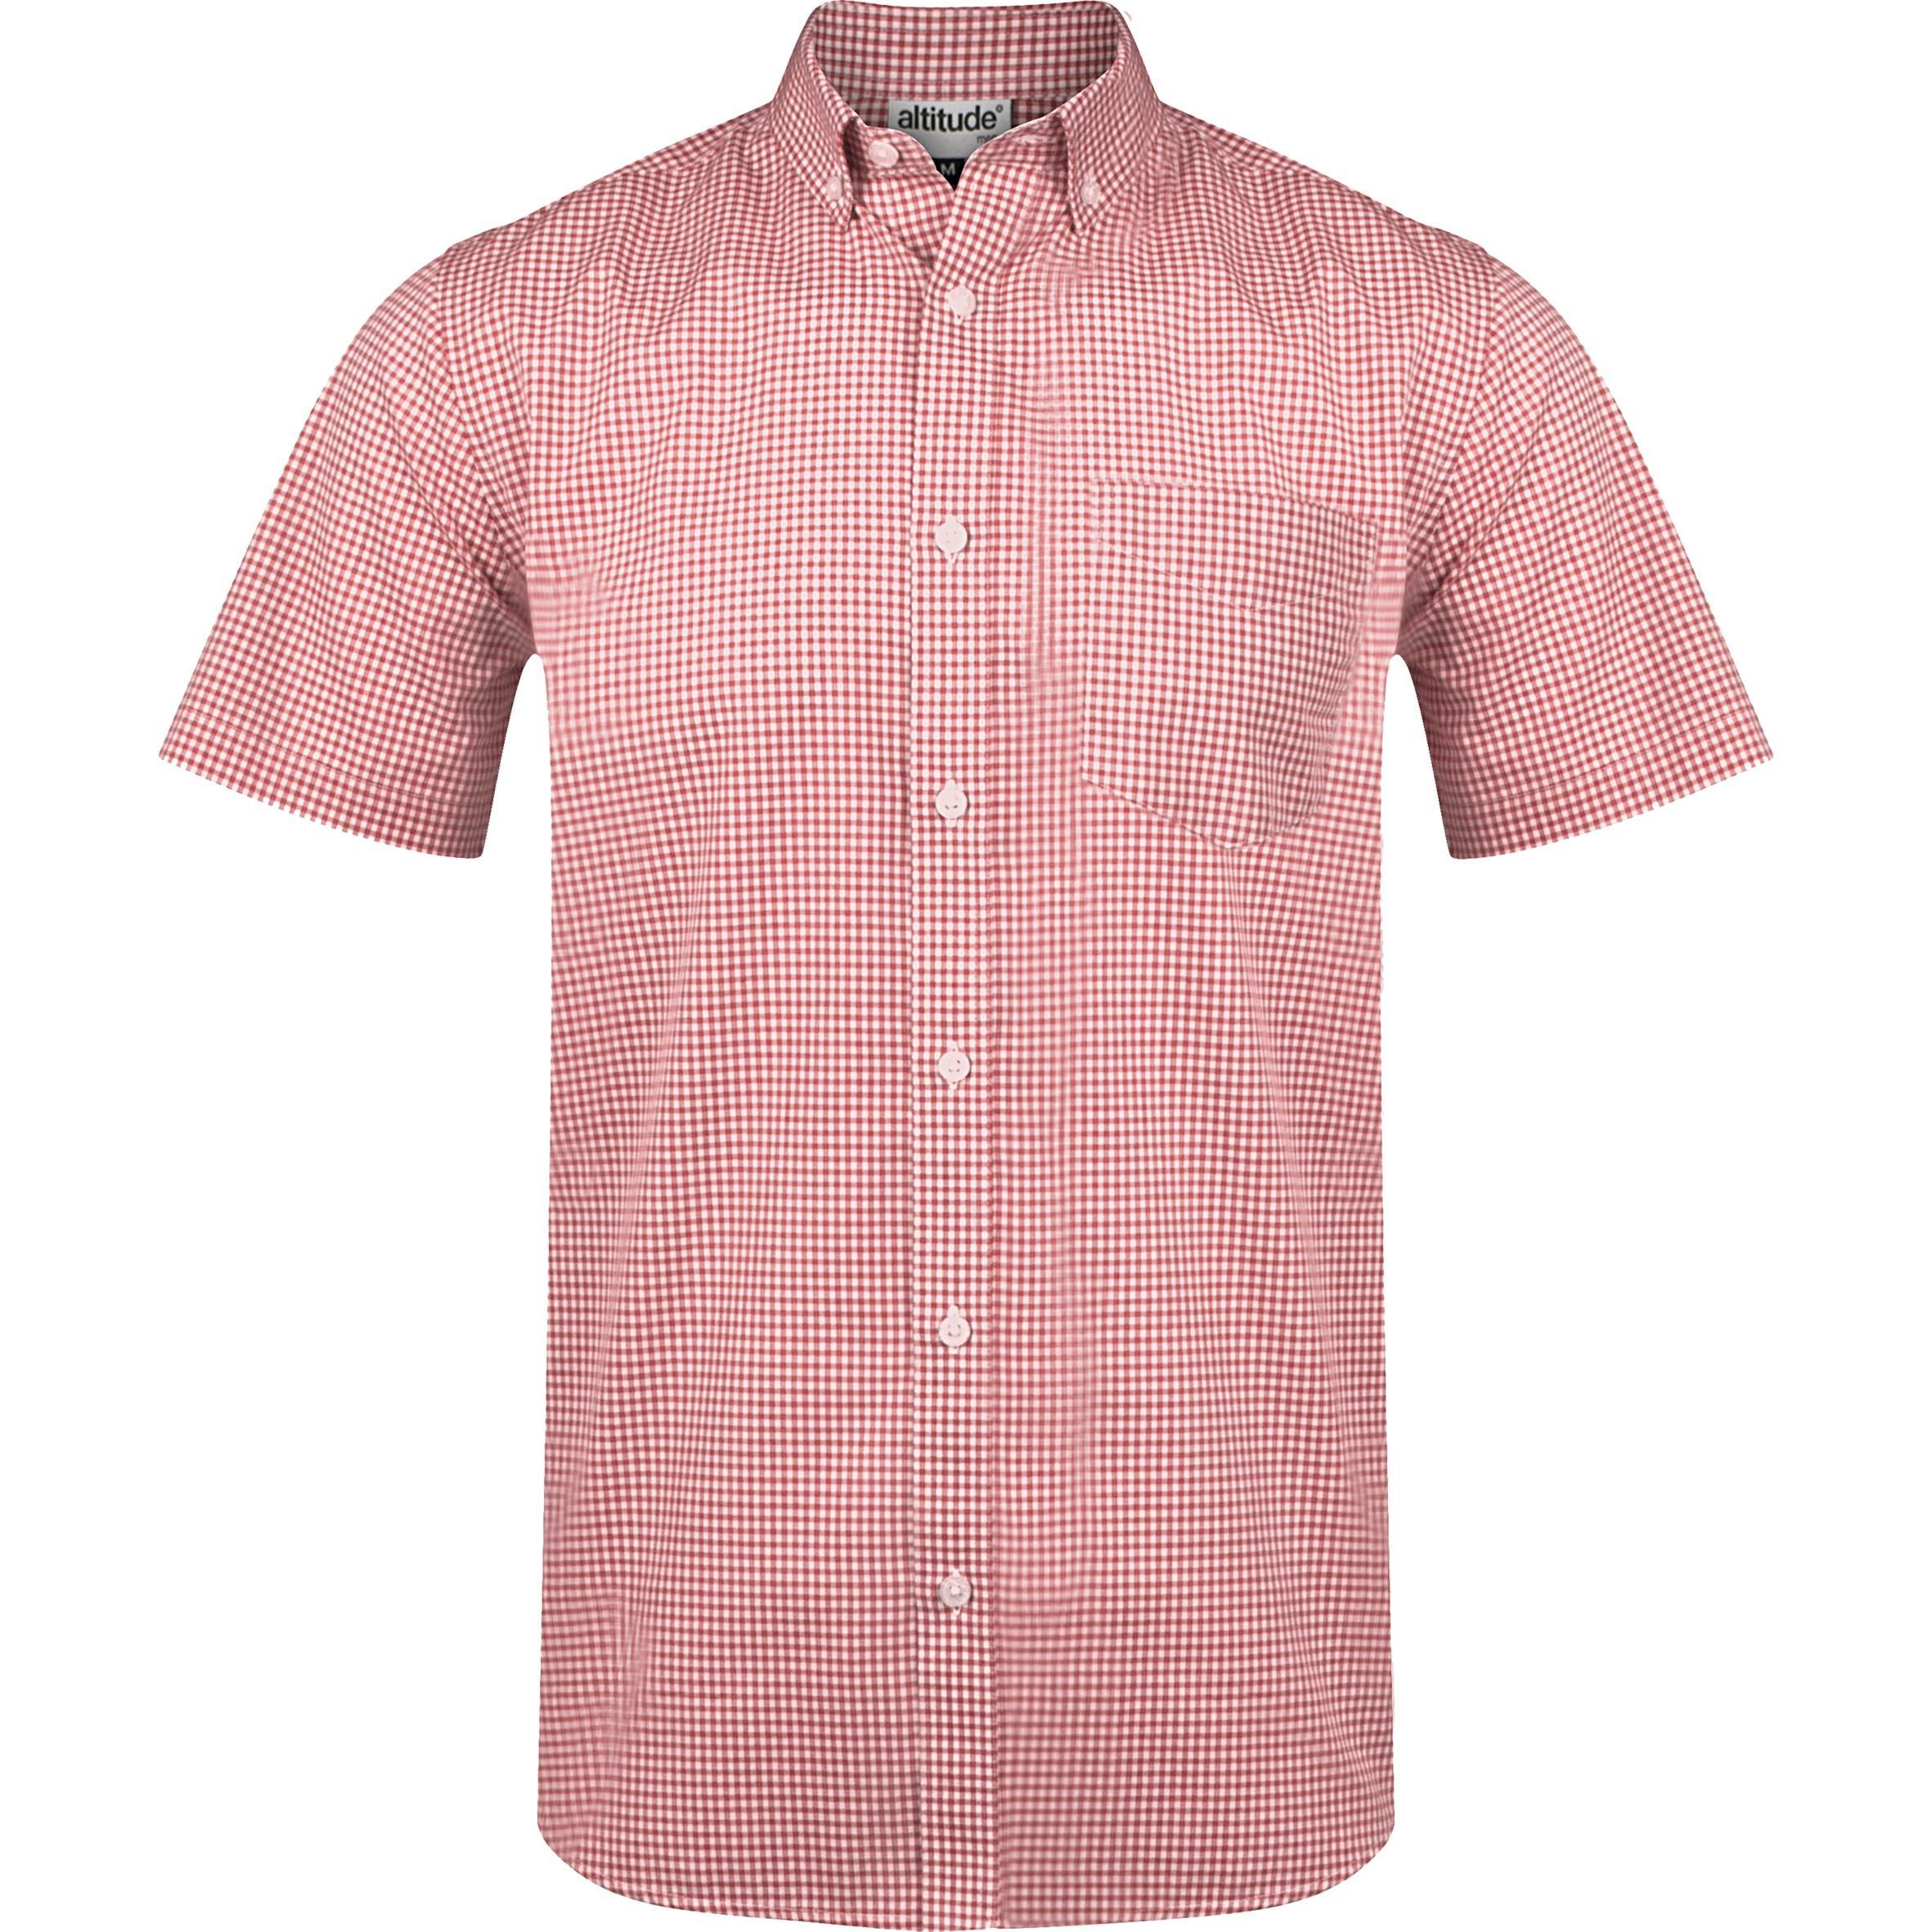 Mens Short Sleeve Edinburgh Shirt - Red Only